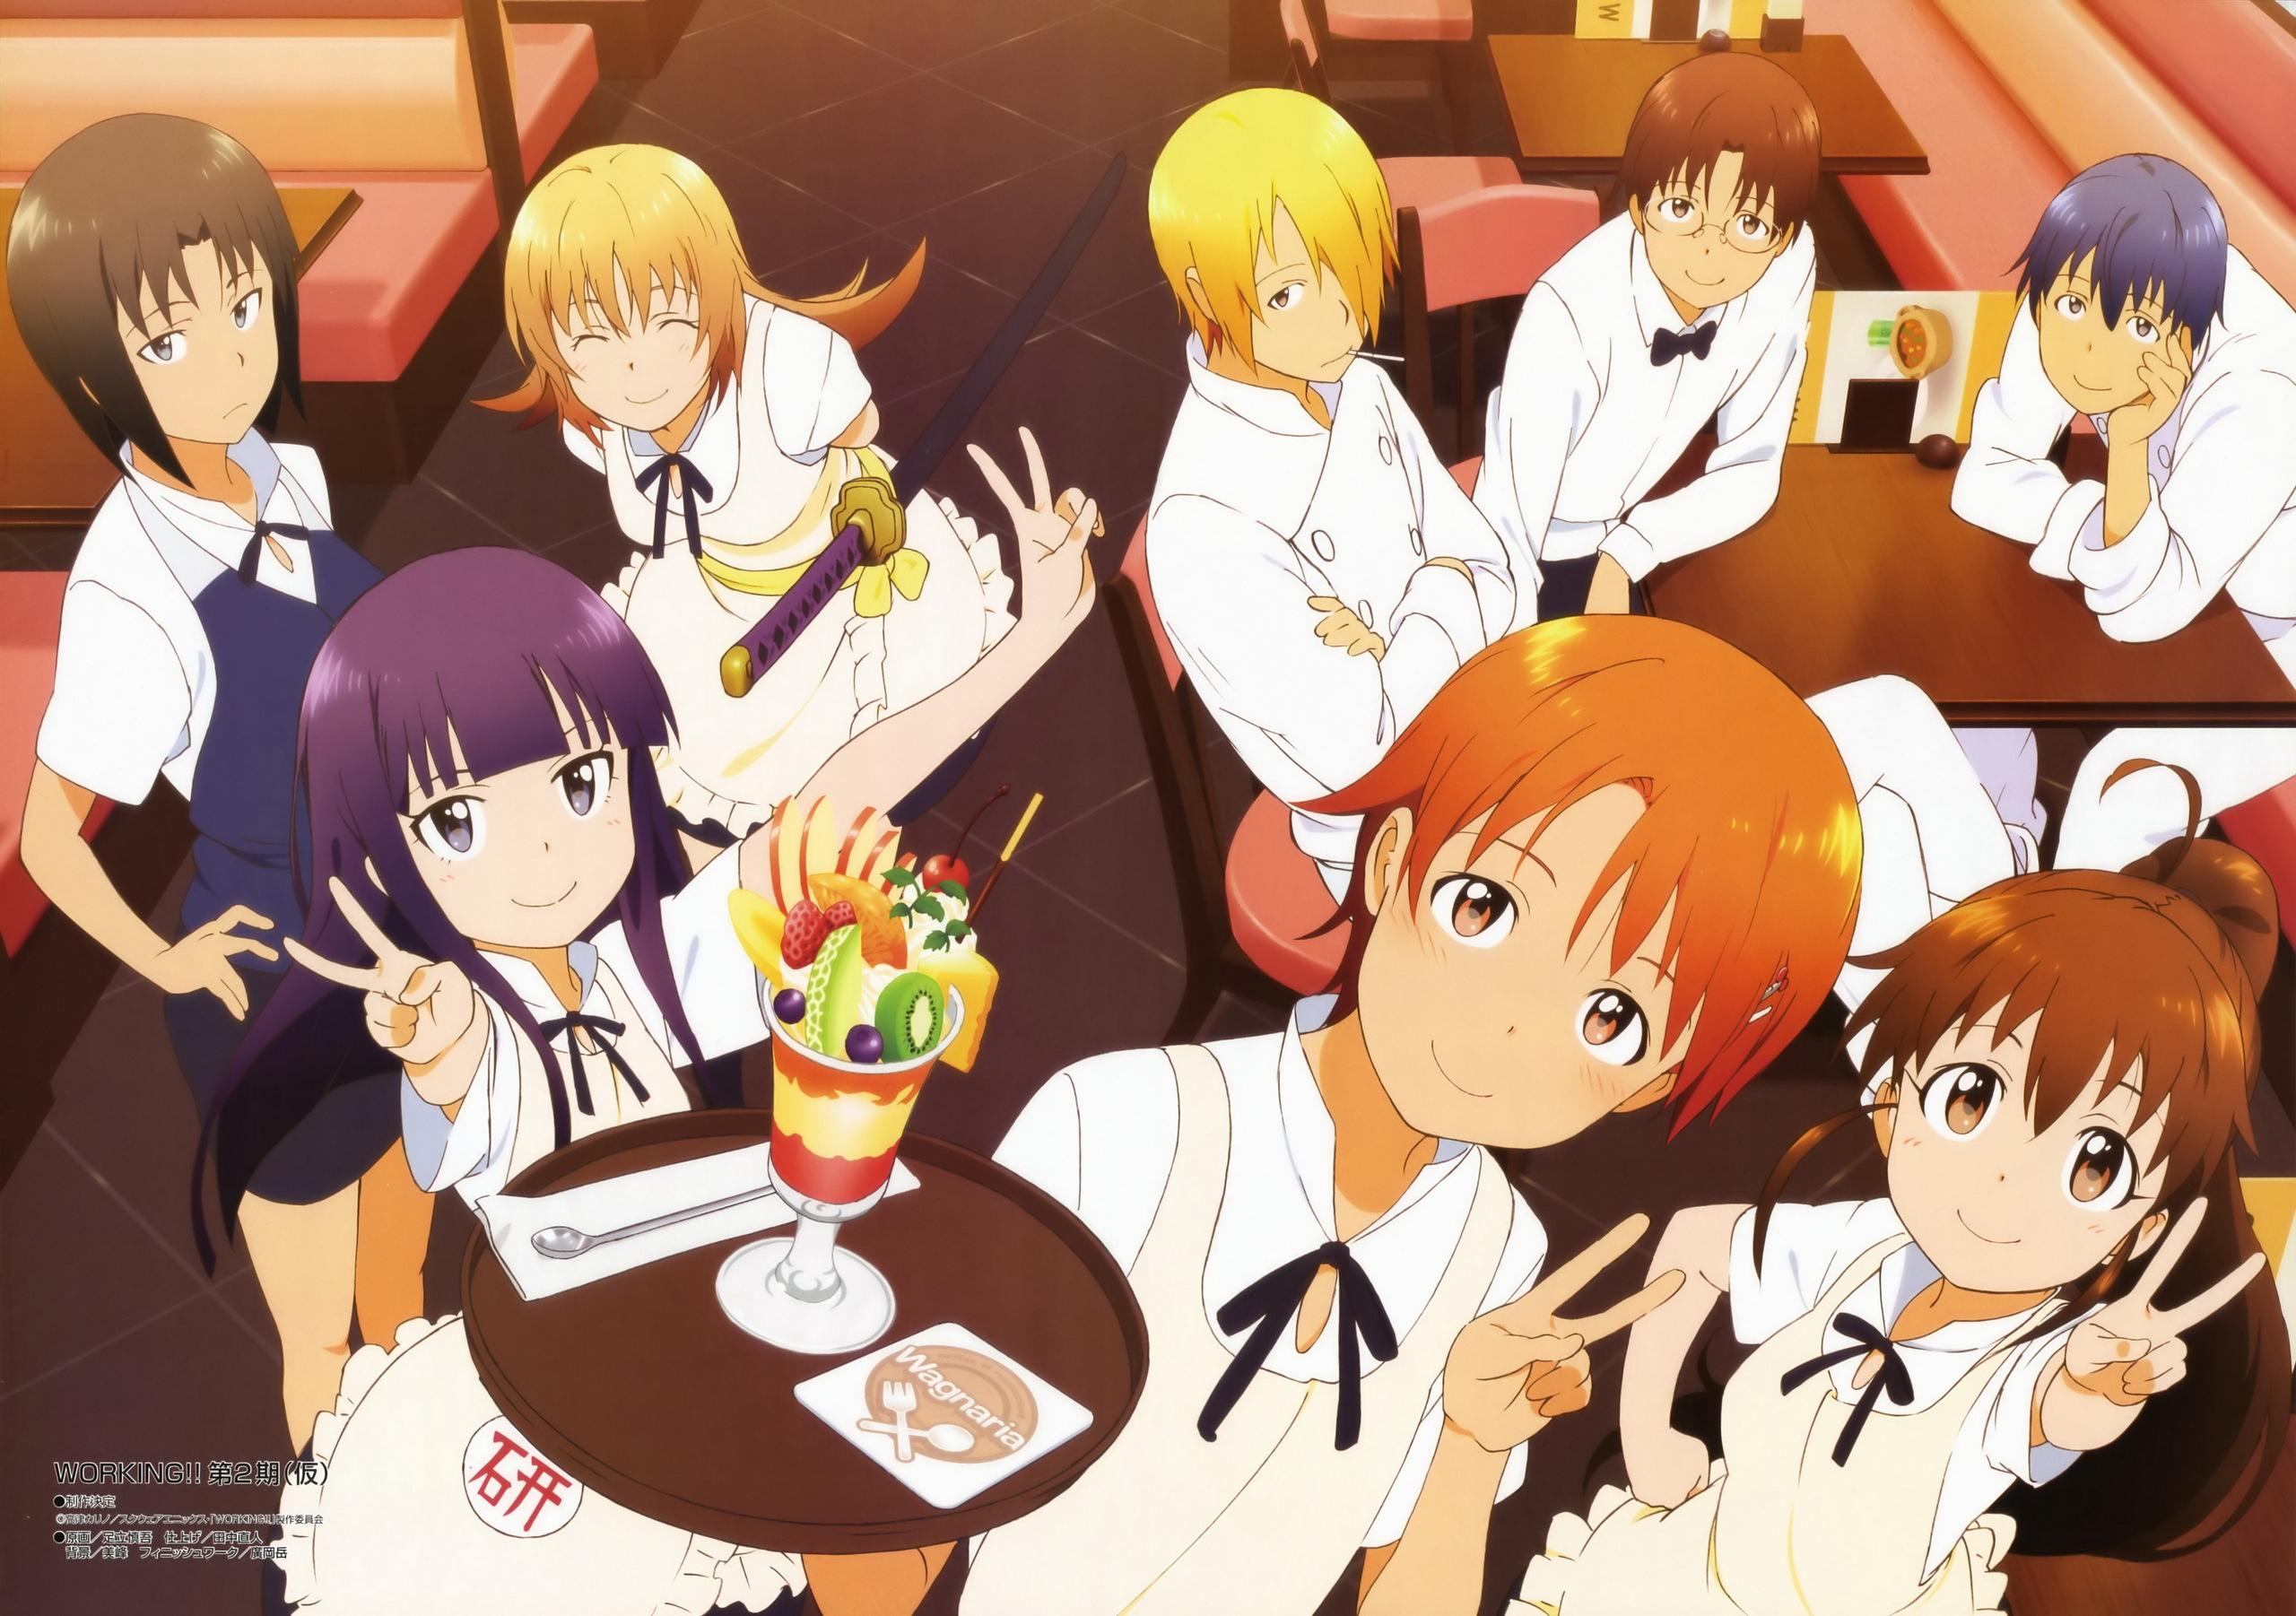 Anime Guide 2